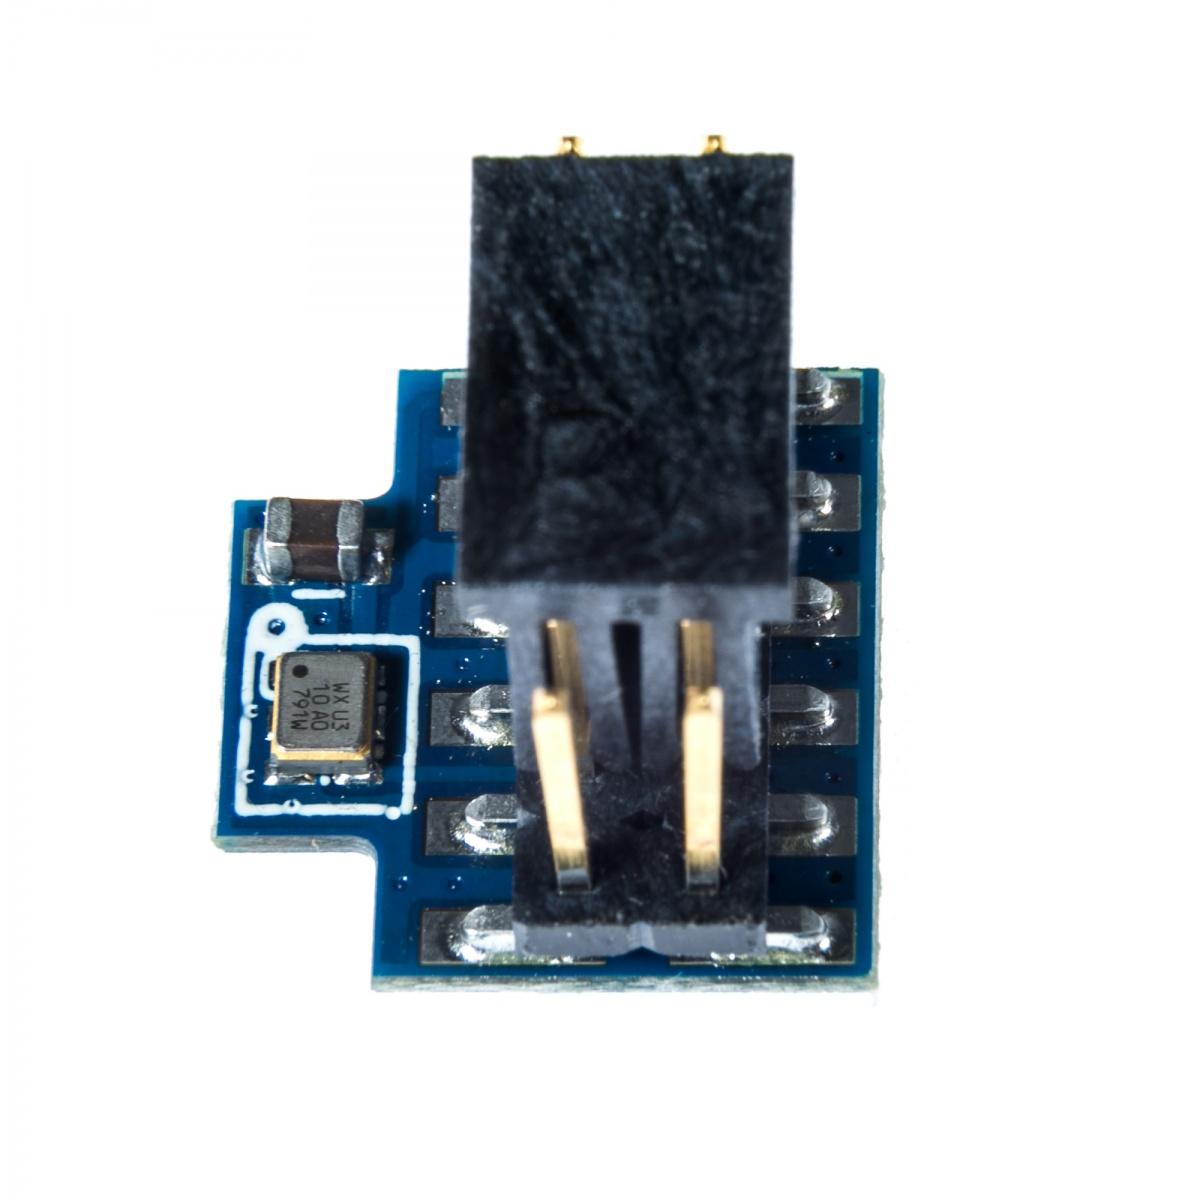 Nooelec hackrf one tiny tcxo mhz ppm module